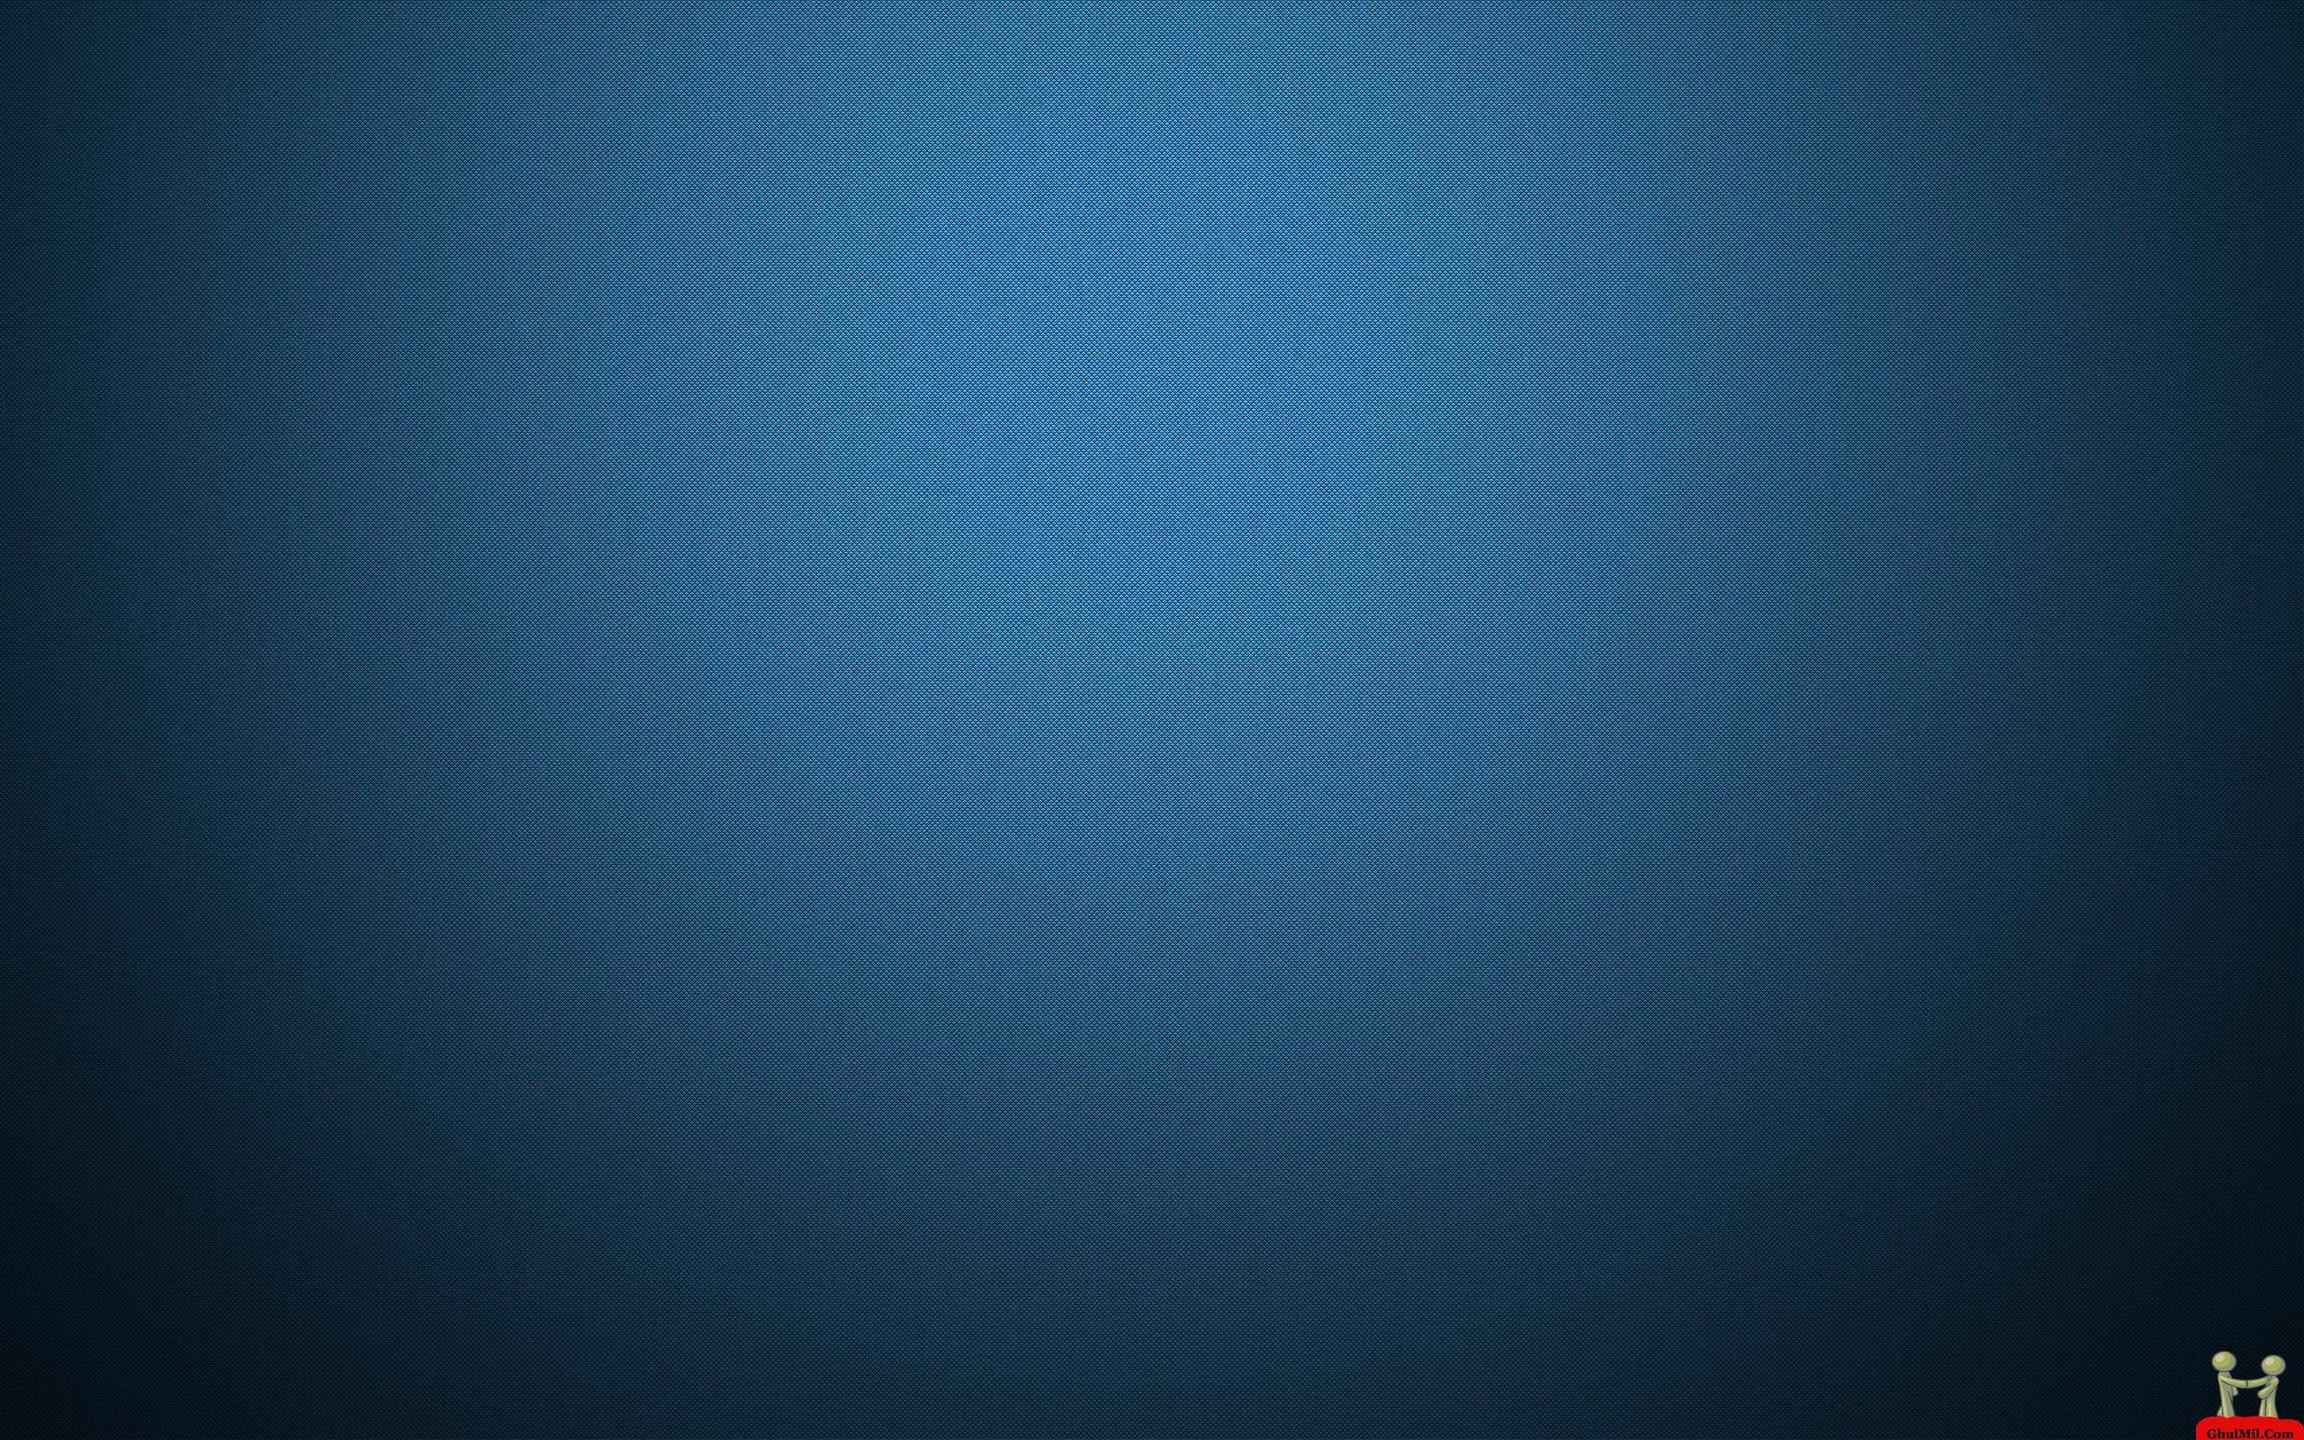 Wallpapers For > Plain Navy Blue Wallpaper